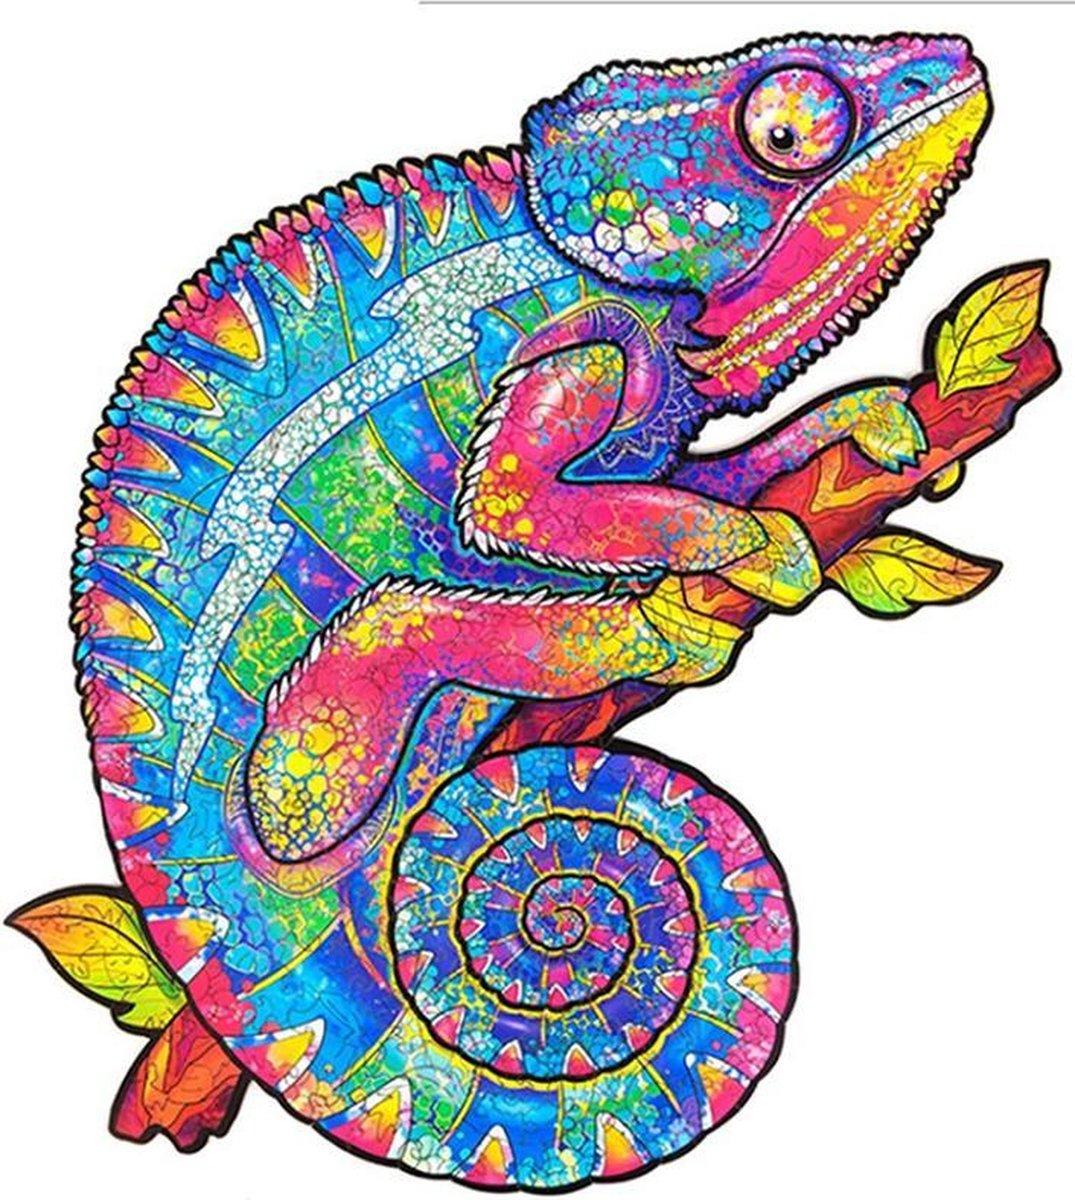 Houten jigsaw puzzel | Dierenfiguur puzzel | Houten dieren Puzzel | Educatieve puzzel | Decoratief | Houten Legpuzzel | Wooden Animal Jigsaw Puzzle | Breinbreker | A3 | Kameleon